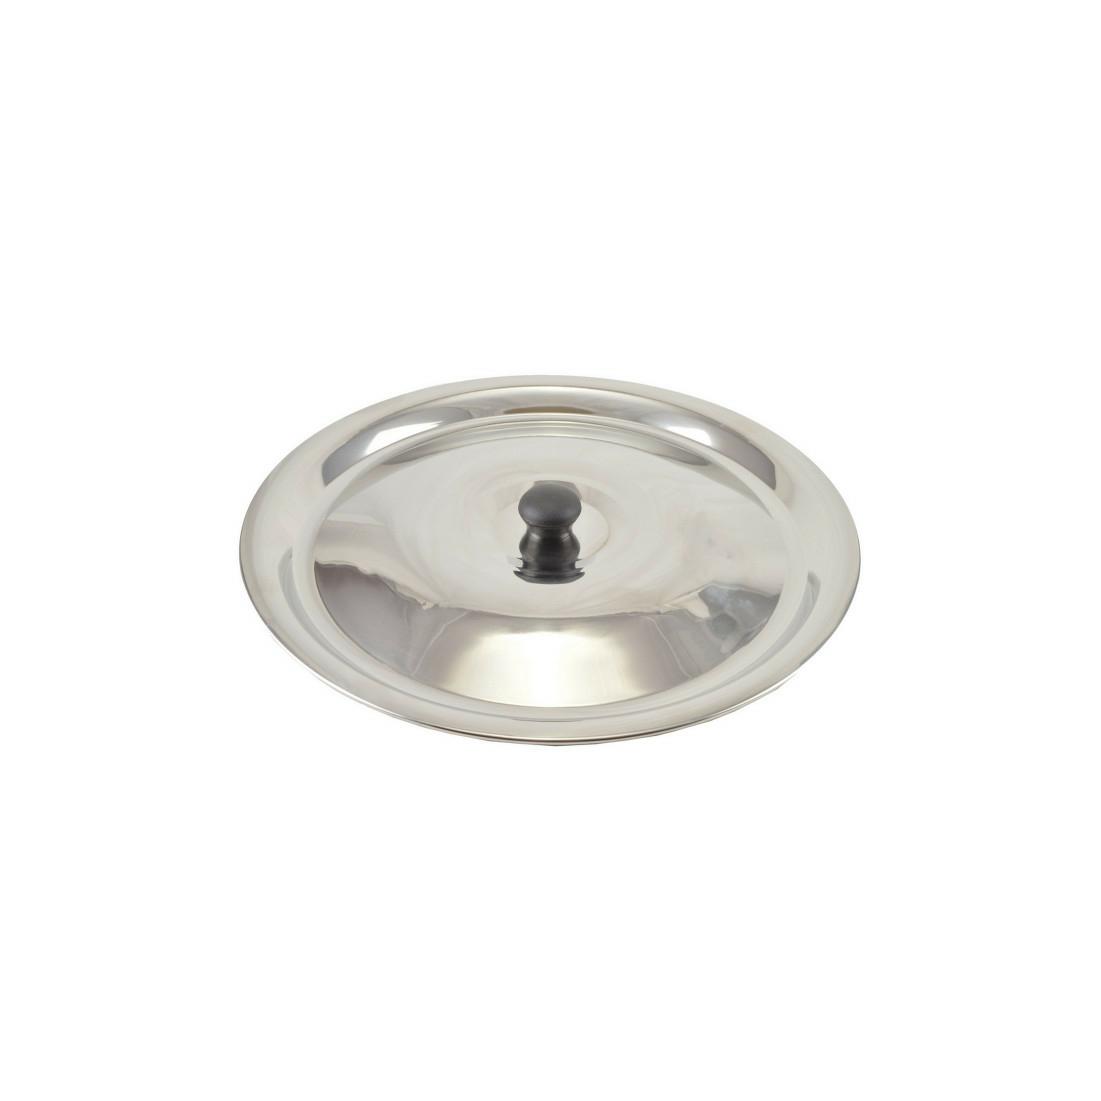 Bográcsfedő inox 10-12 liter